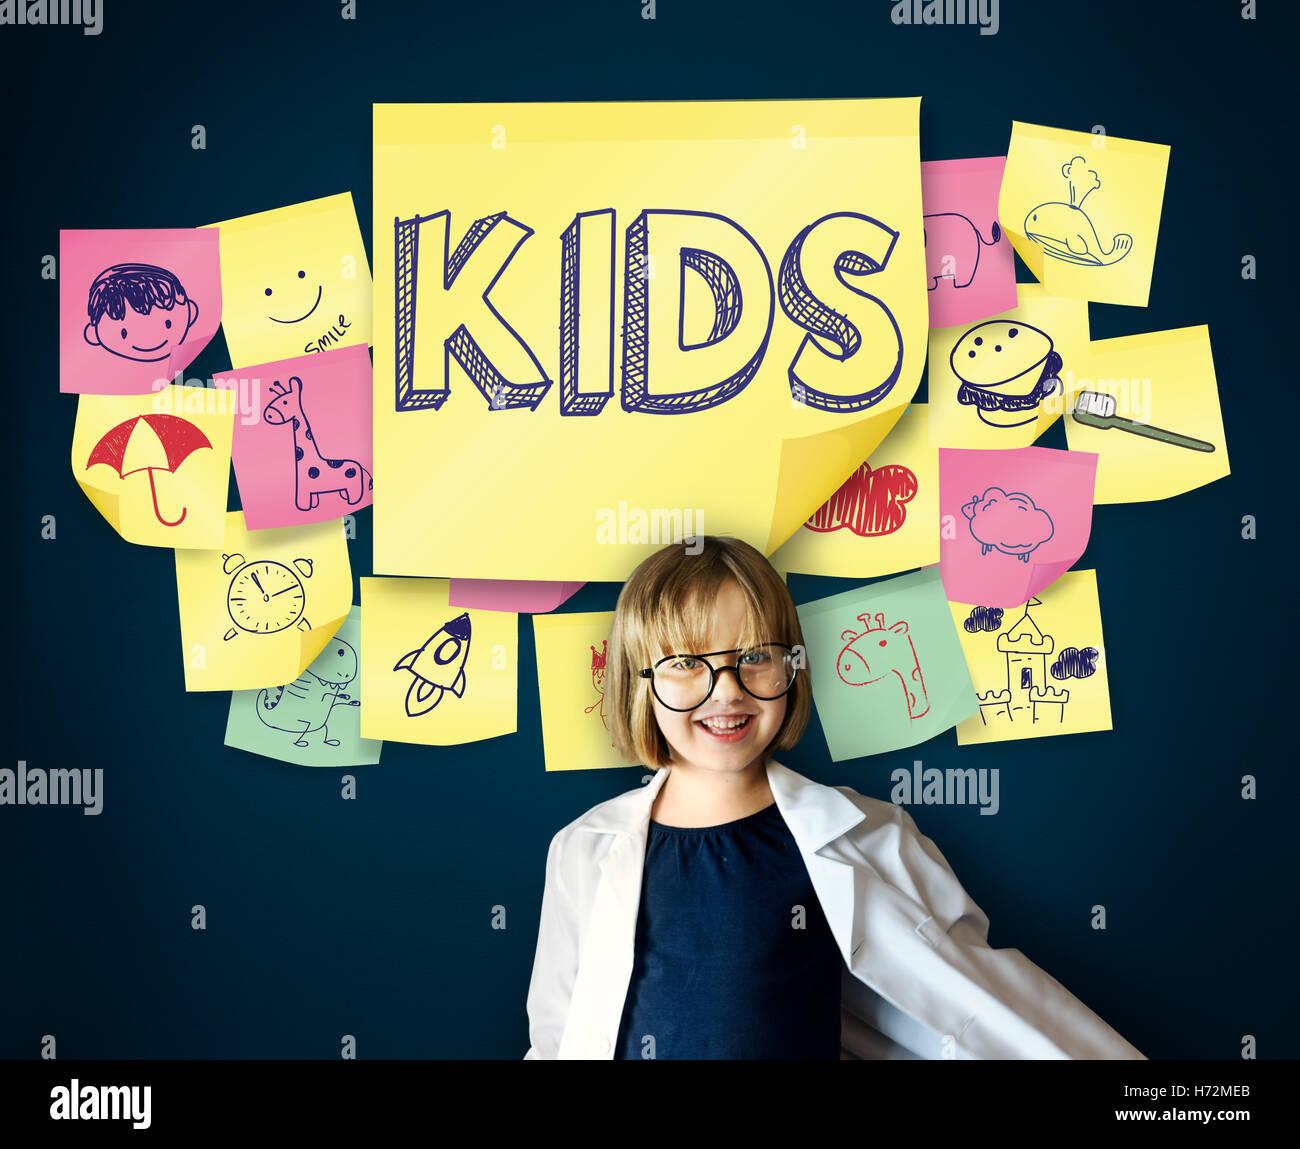 Children Playful Happiness Enjoyment Childhood Concept - Stock Image